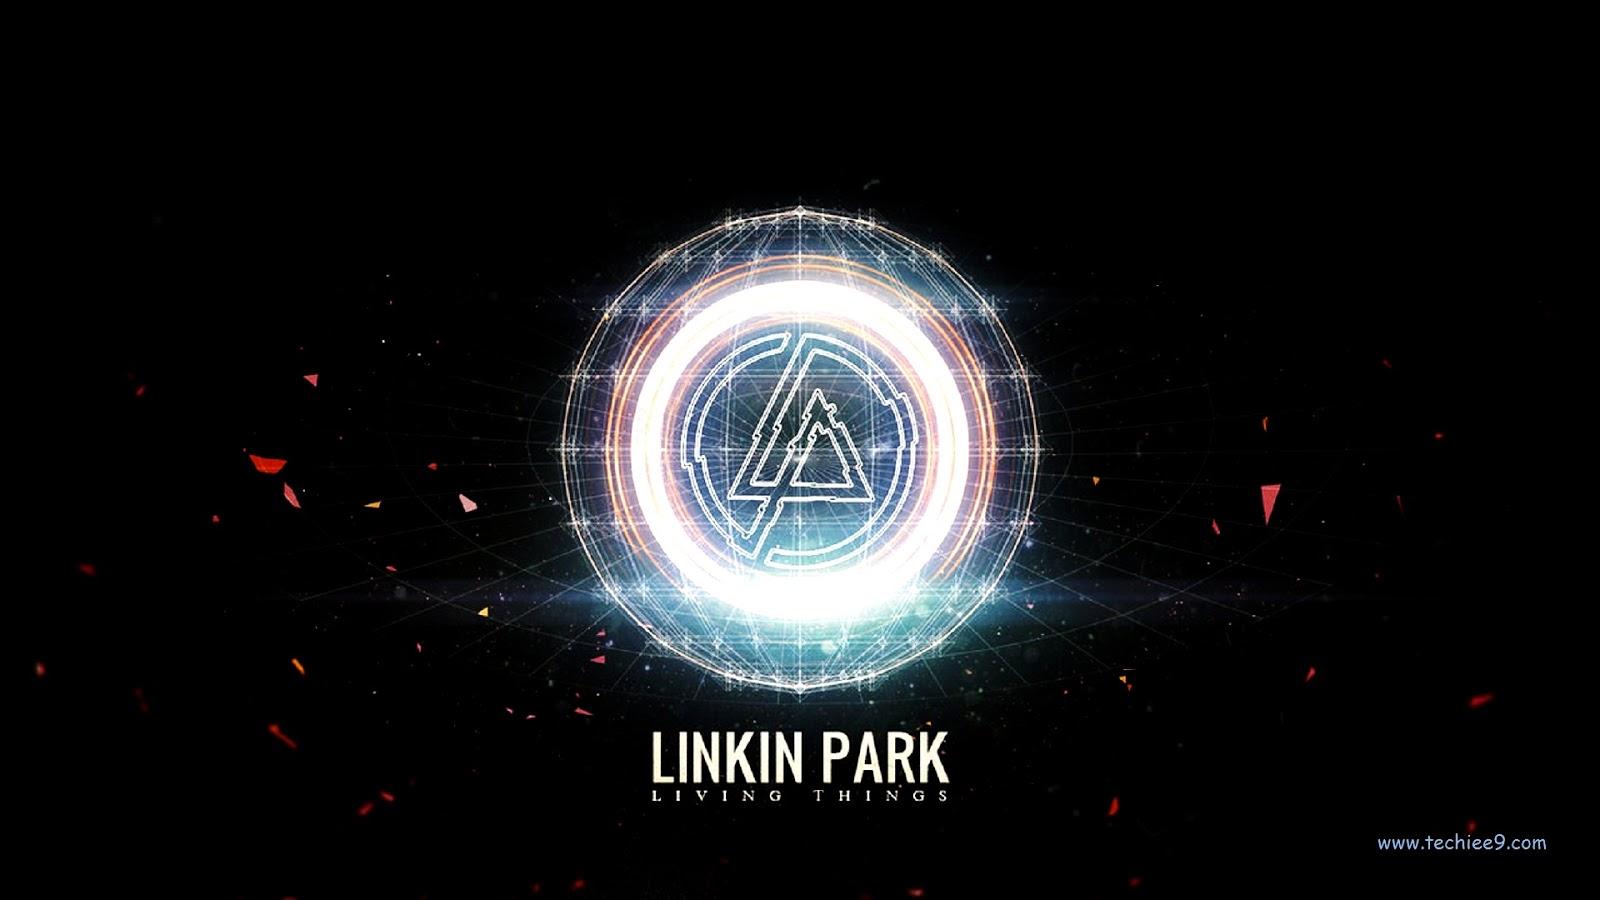 linkin park living things music band full hd 1920x1080